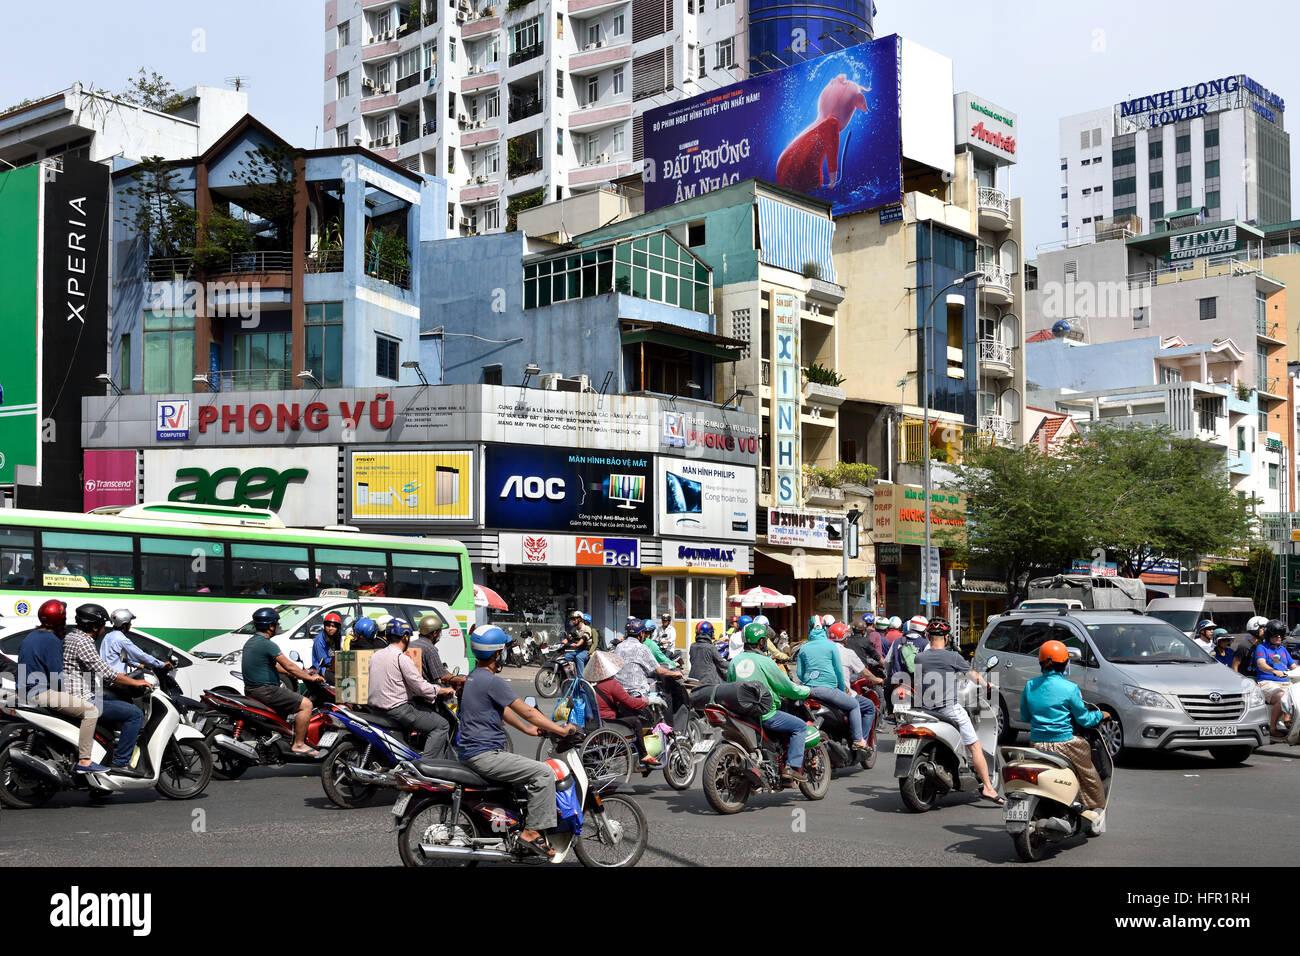 Rush hour commuters car taxis scooters motorcycles Pham Viet Chanh street - Nga Sau Cong Hoa  Ho Chi Minh City (Saigon) - Stock Image